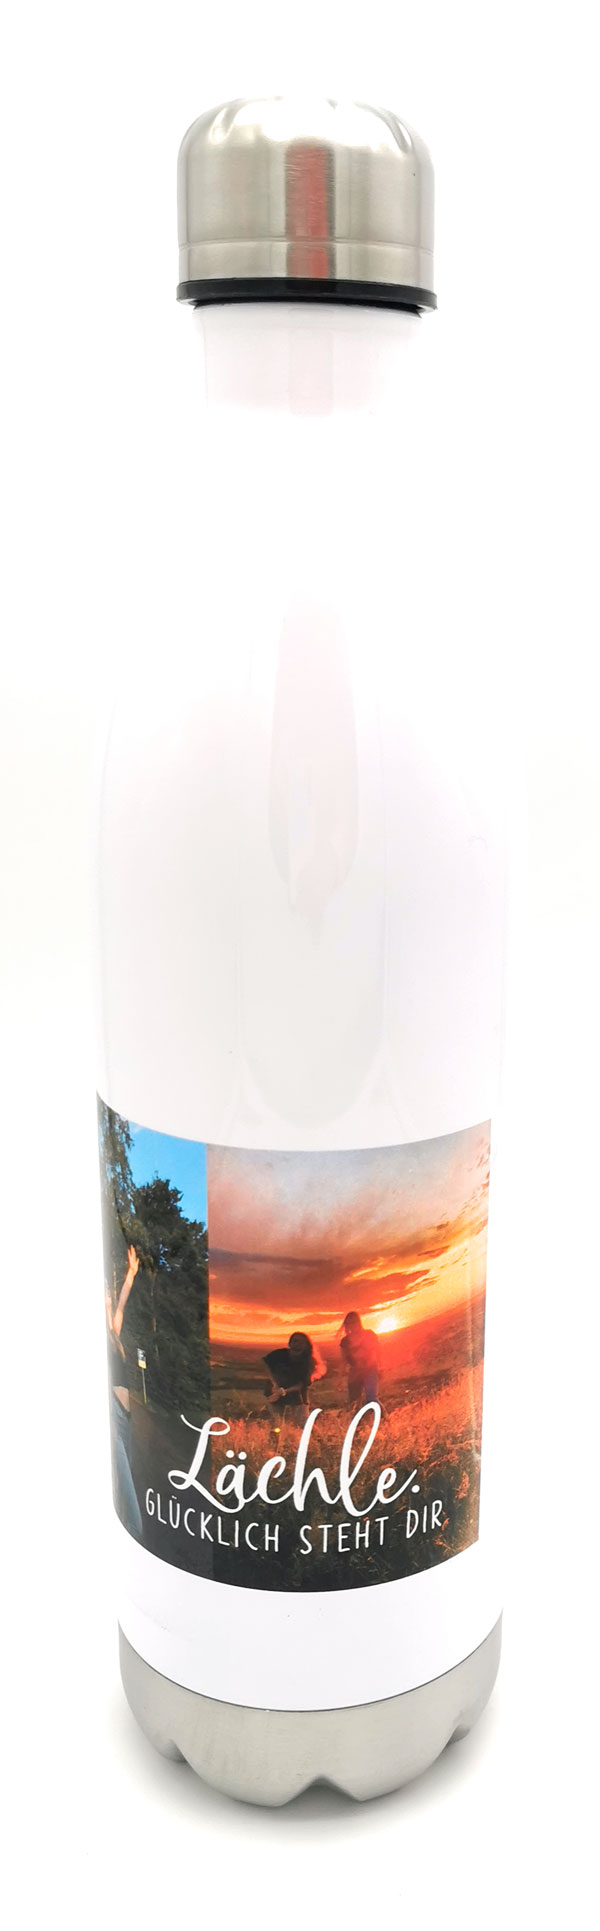 thermoflasche-druckwunder-geschenke-fotodruck-geschenkeonline-esslingen